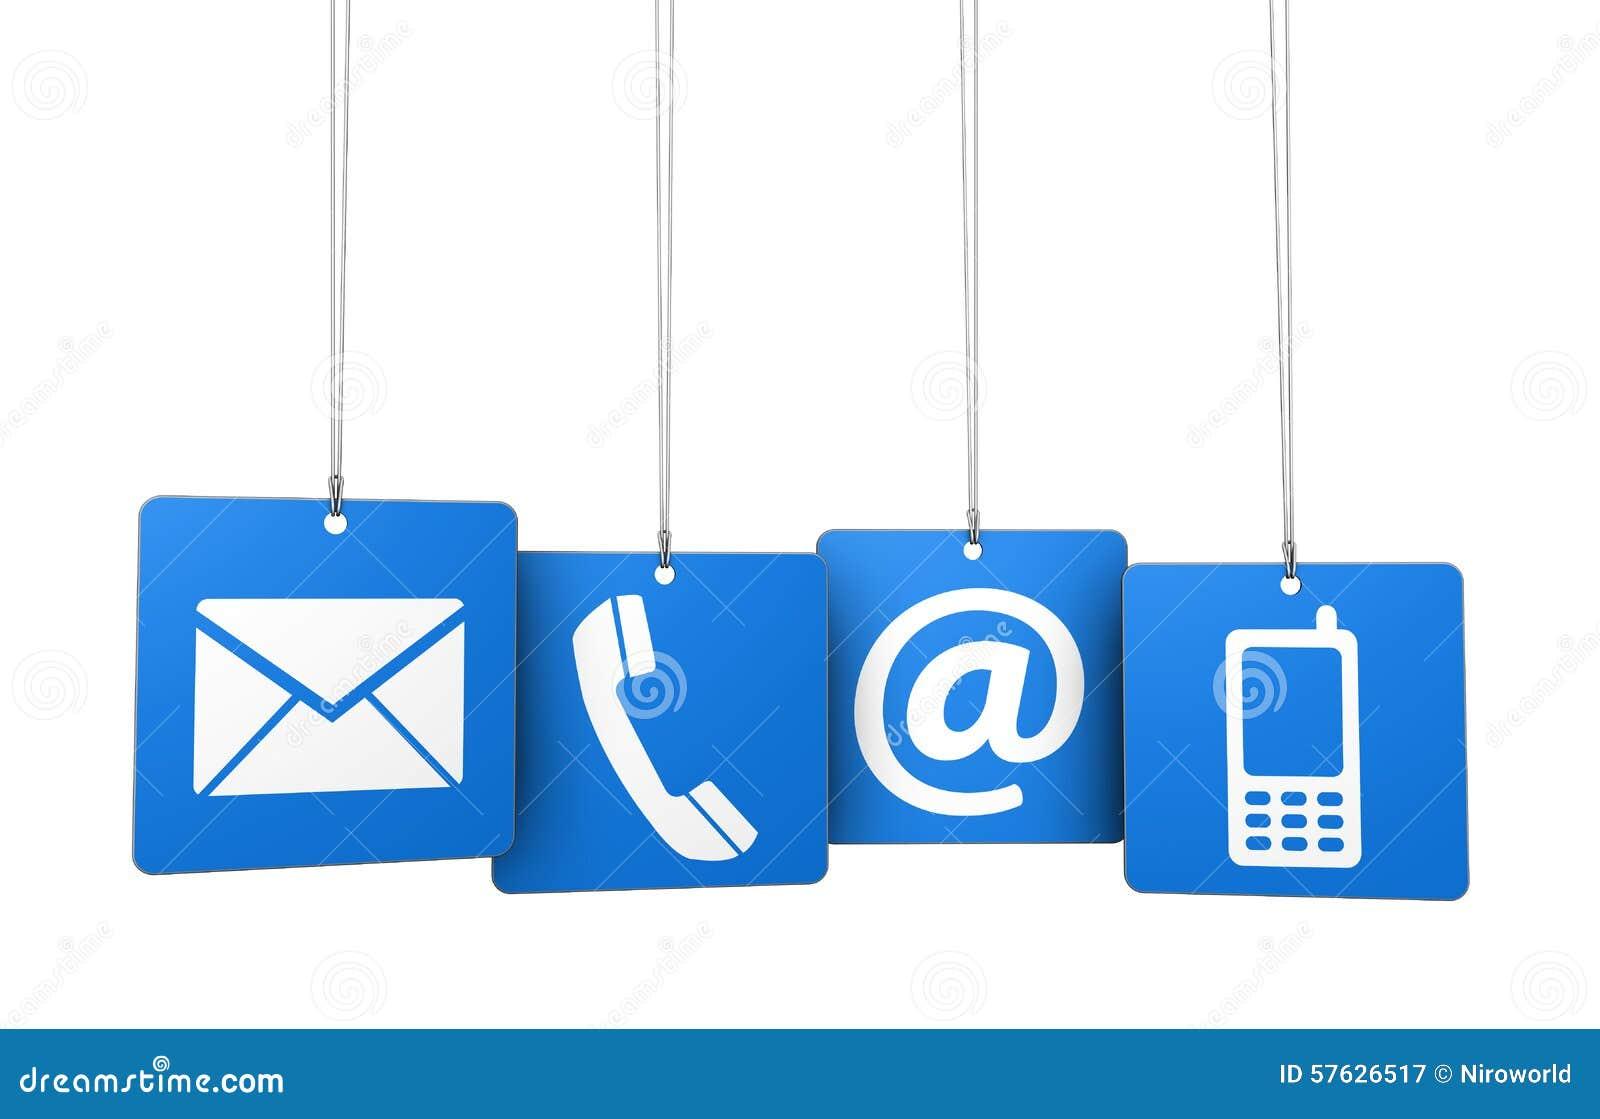 Web icons contact us stock illustration image of contact 31517096 contact us web icons on blue tags royalty free stock photography biocorpaavc